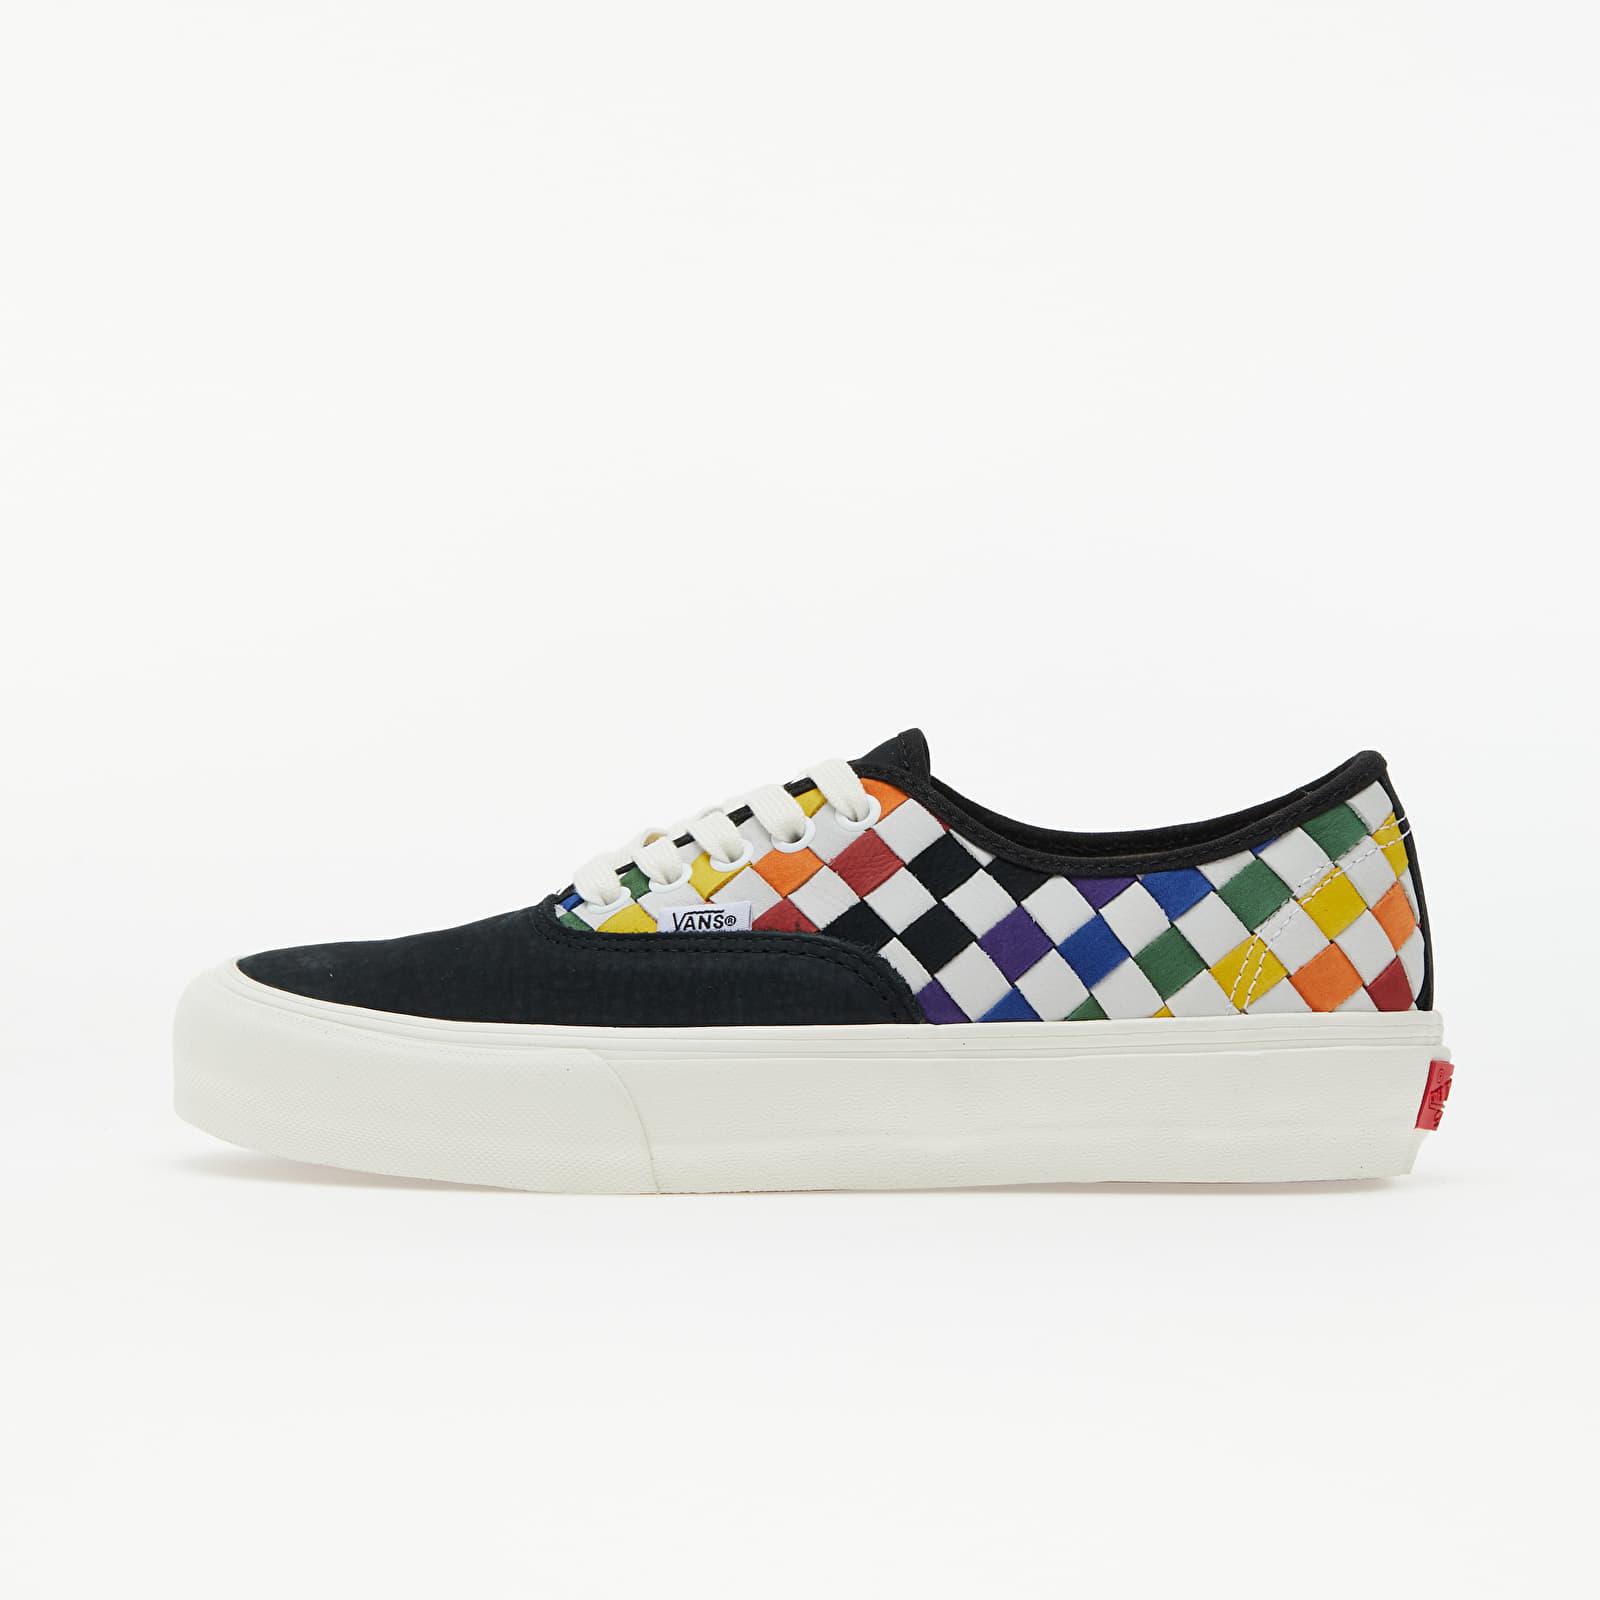 Vans Vault Authentic LX (Pride) Woven Leather/ Rainbow/ Marshmallo   Footshop